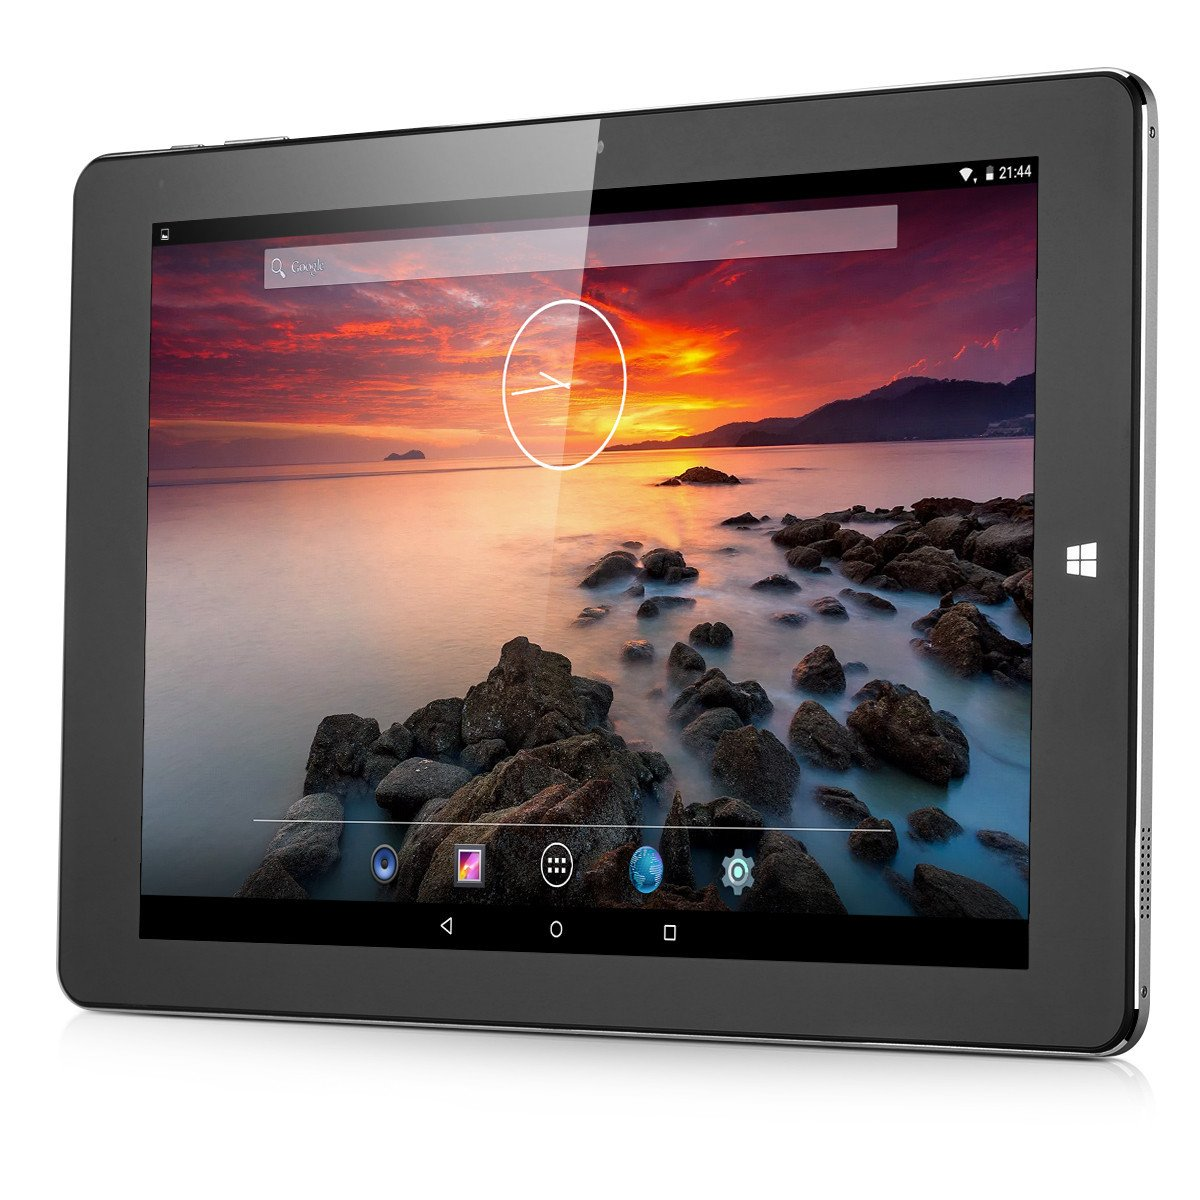 "10.8"", CHUWI Hi10 Plus, Tablet PC, HD 1920 1280, Win10 + Android5.1, Intel Z8350, Quad-core, 1.44GHz, 4GB / 64GB, WiFi/BT / External 3G"